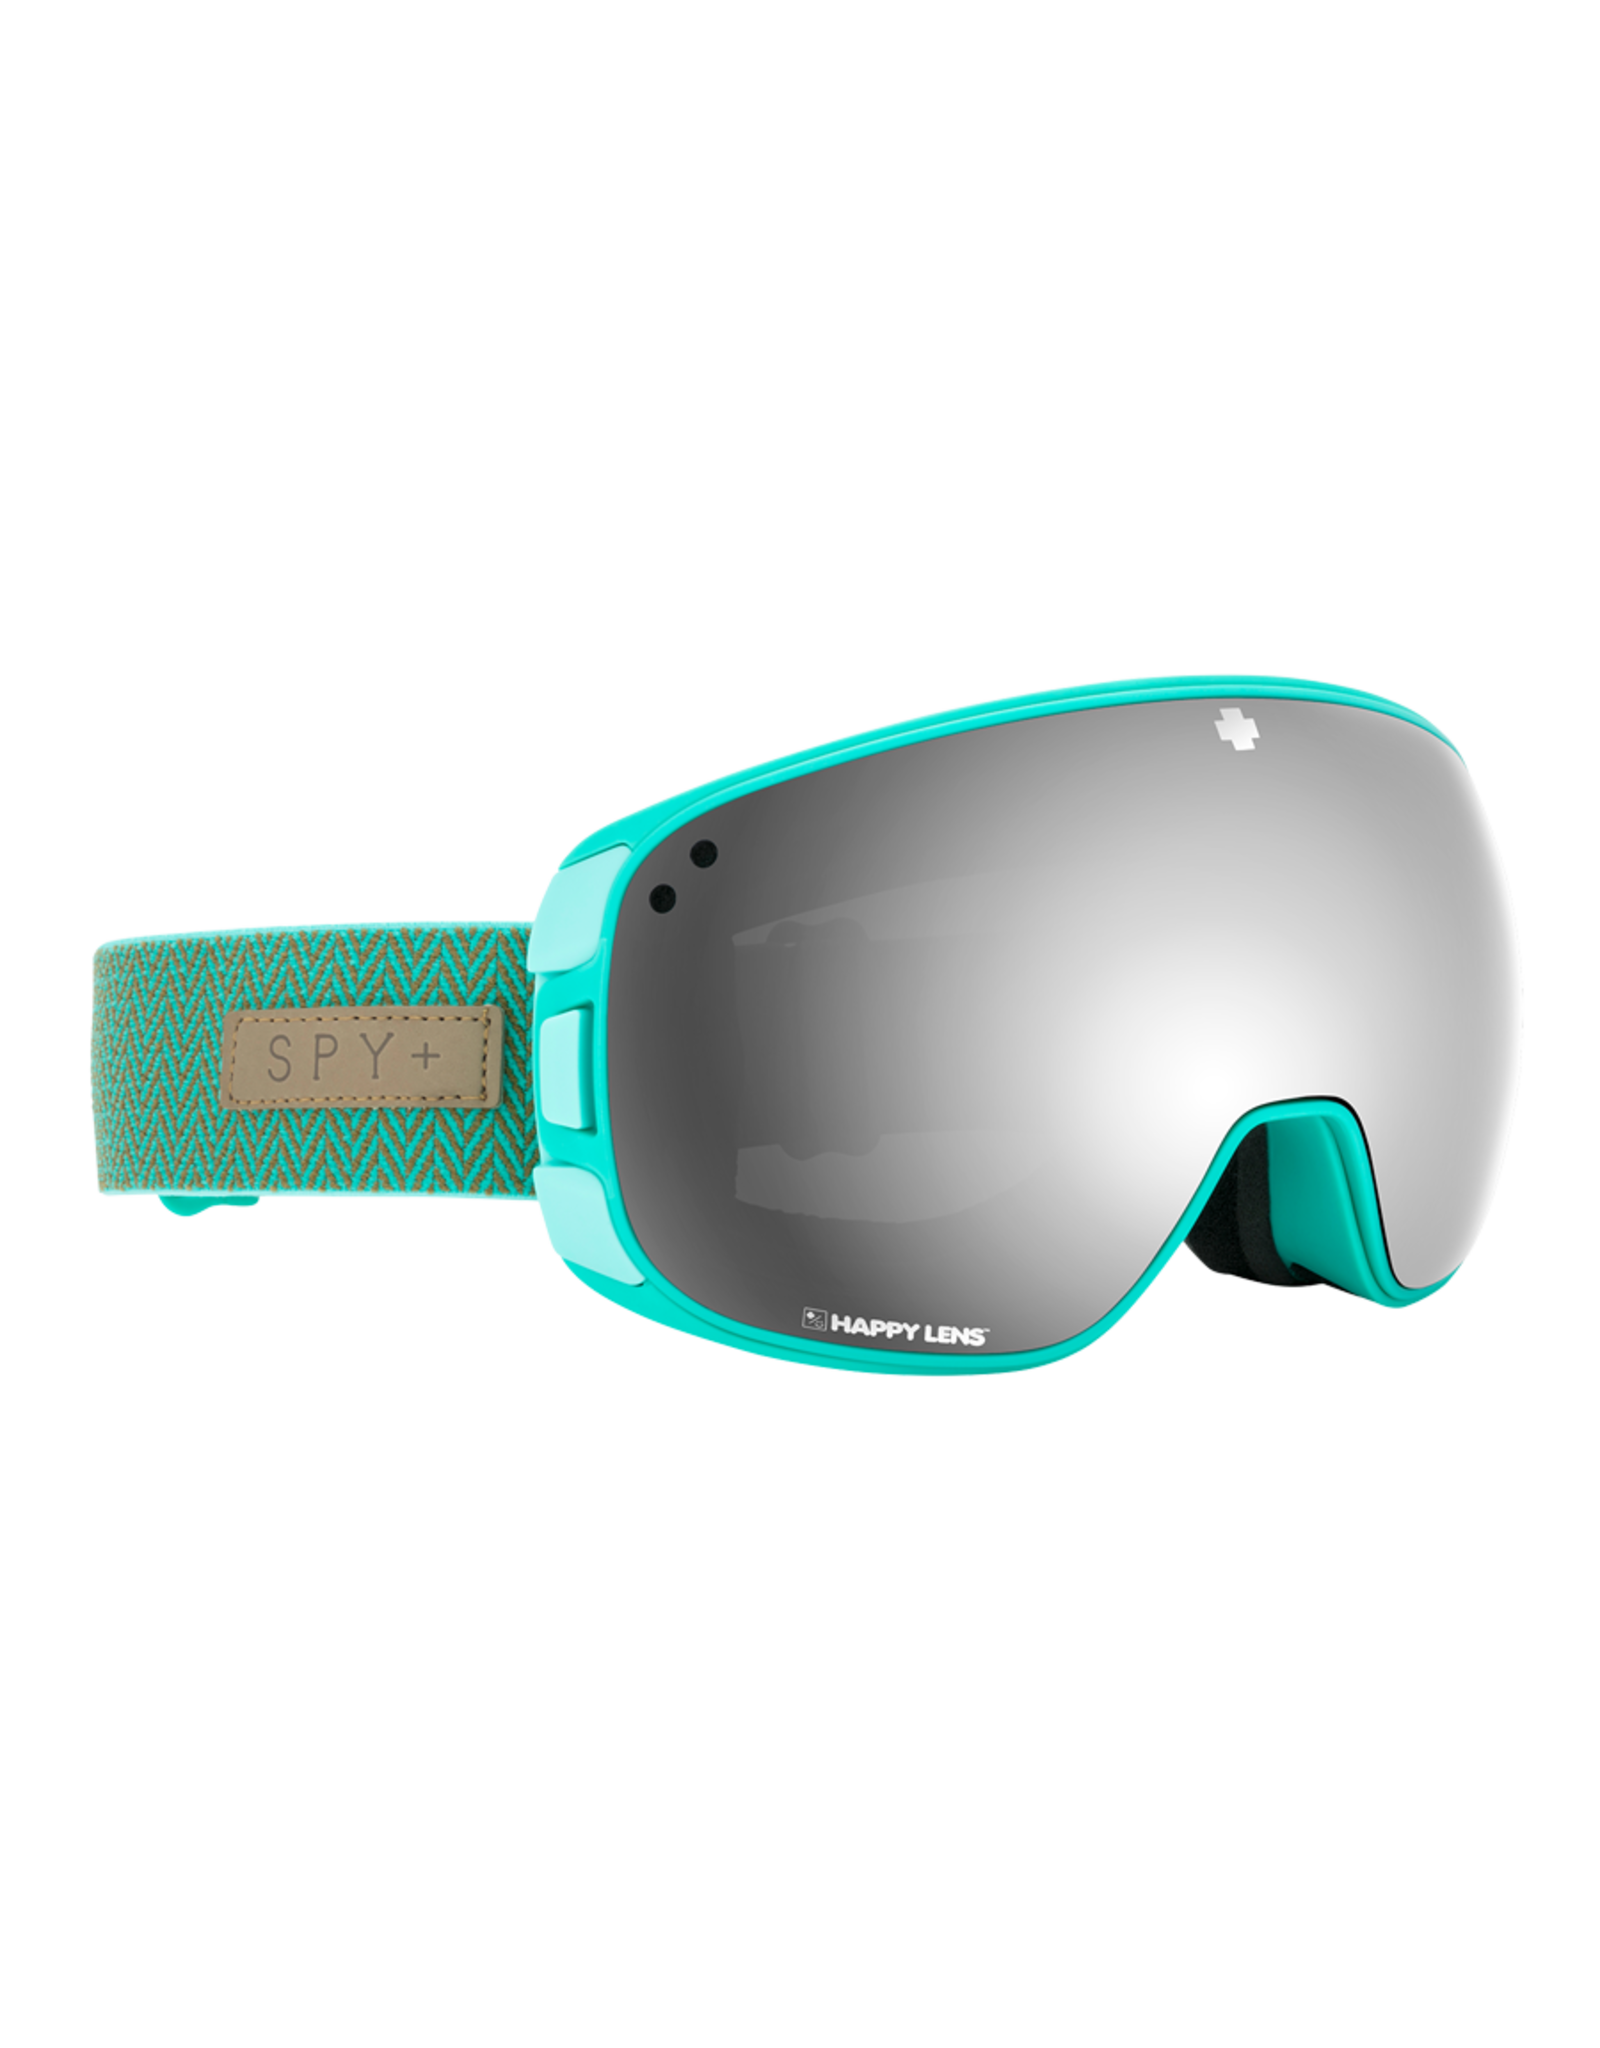 SPY Bravo Herringbone Mint w/HD Plus Gray Green /Silver Spectra Mirror and HD Plus LL Yellow/Green Spectra Mirror